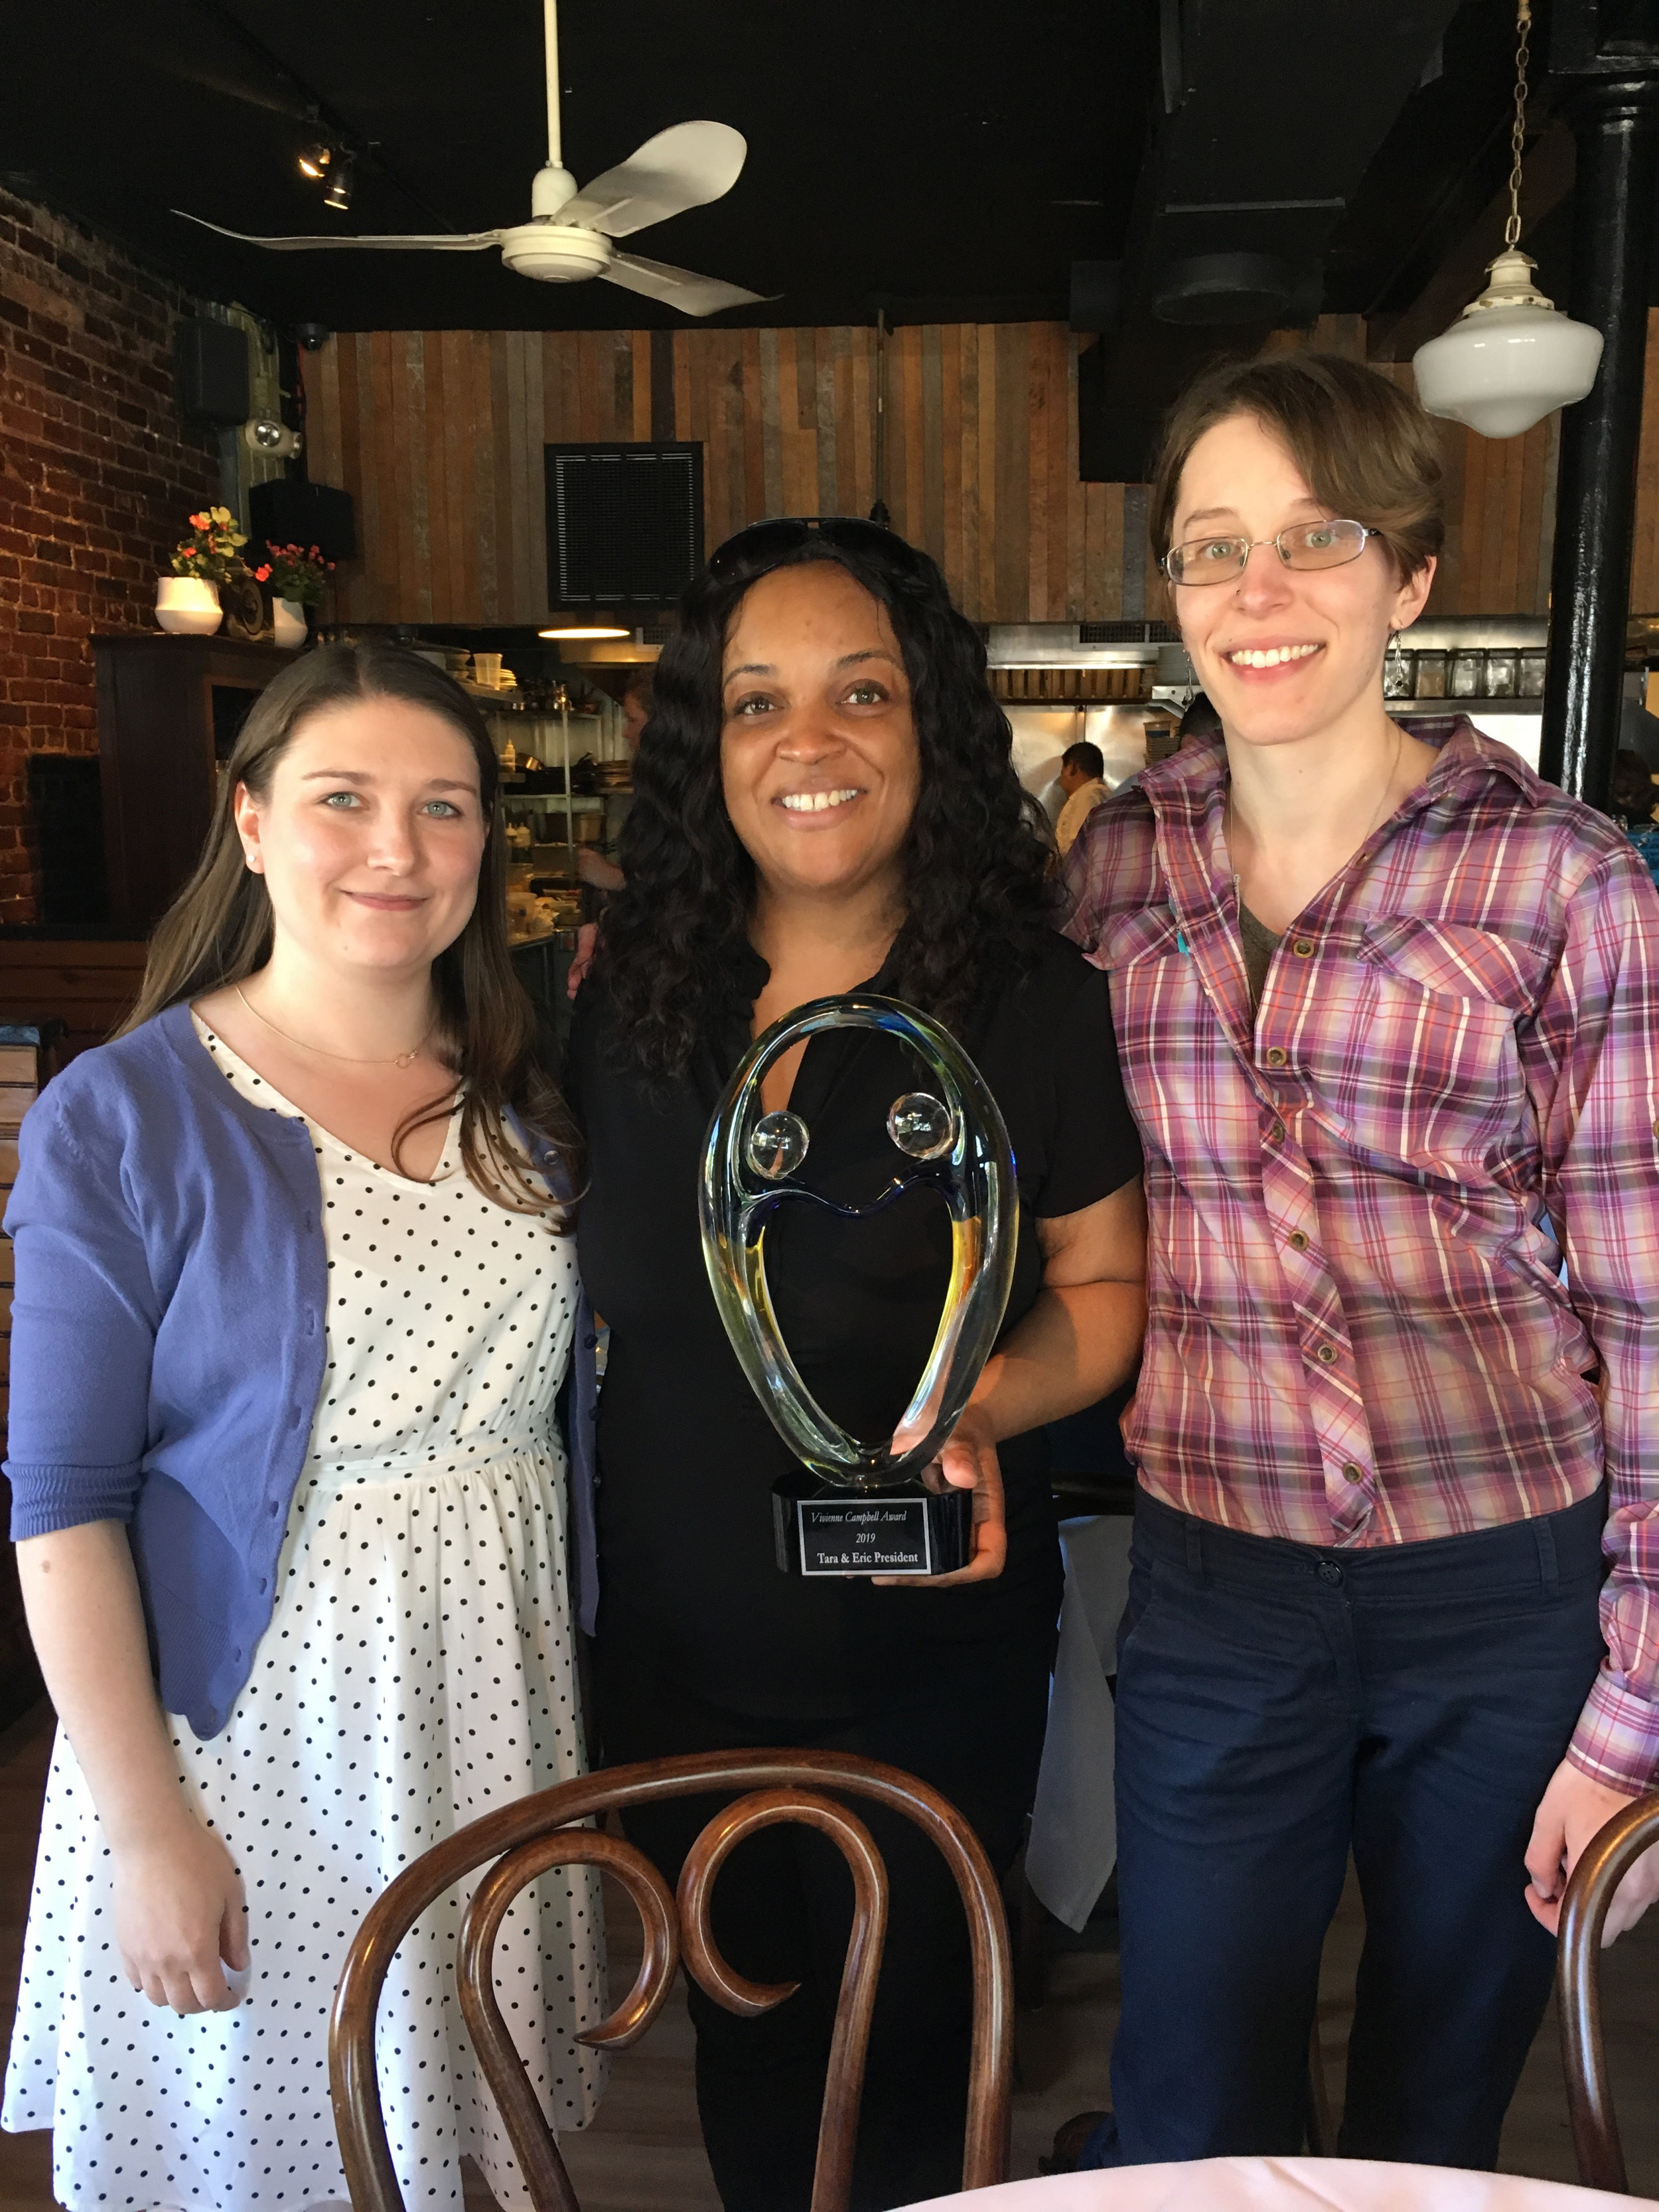 Tara President with IFC Program Director Jillian Nebesar and IFC Social Worker Hannah Bowe